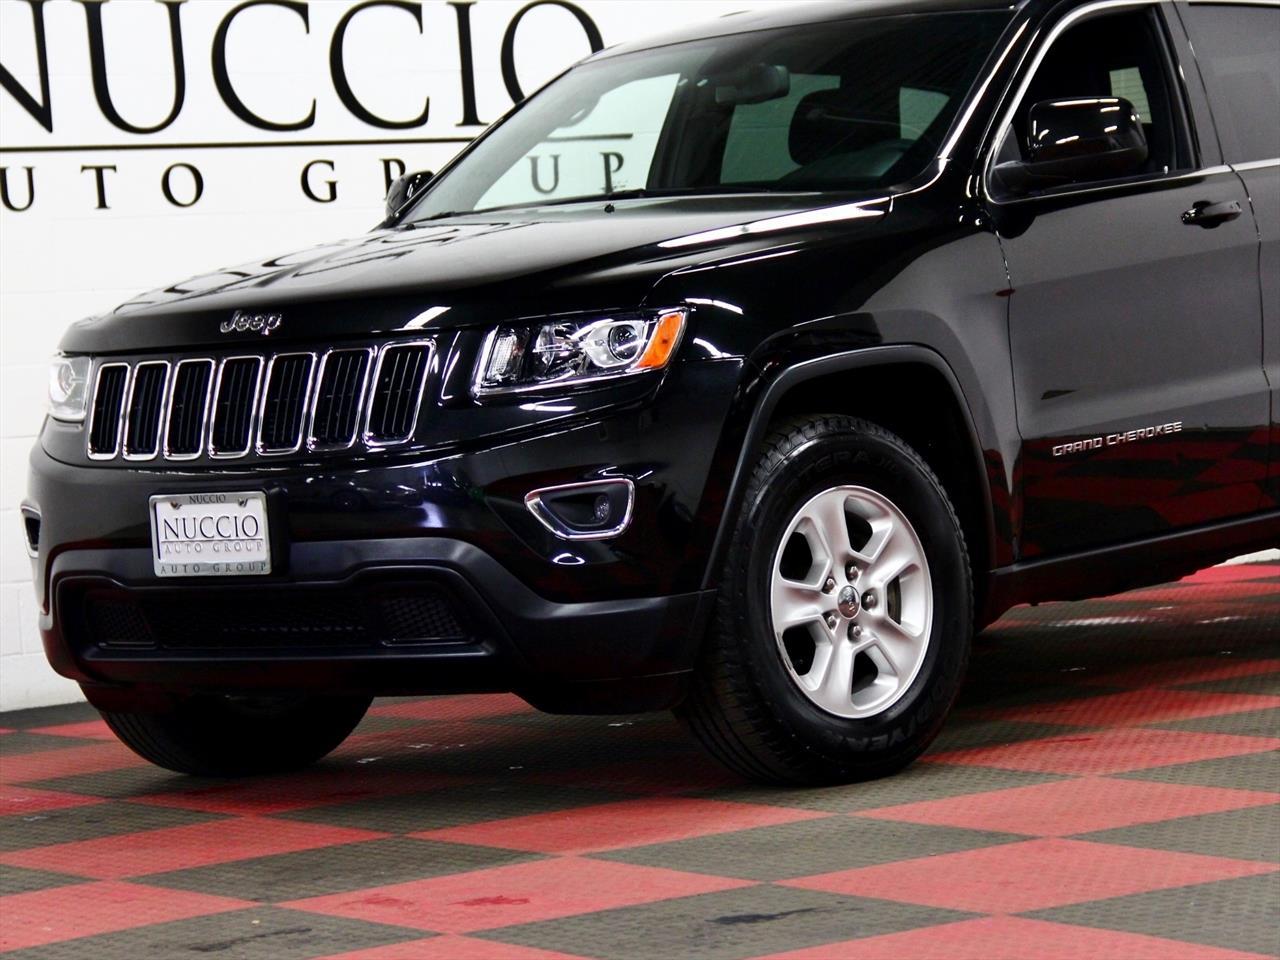 2014 jeep grand cherokee laredo 4x4. Black Bedroom Furniture Sets. Home Design Ideas